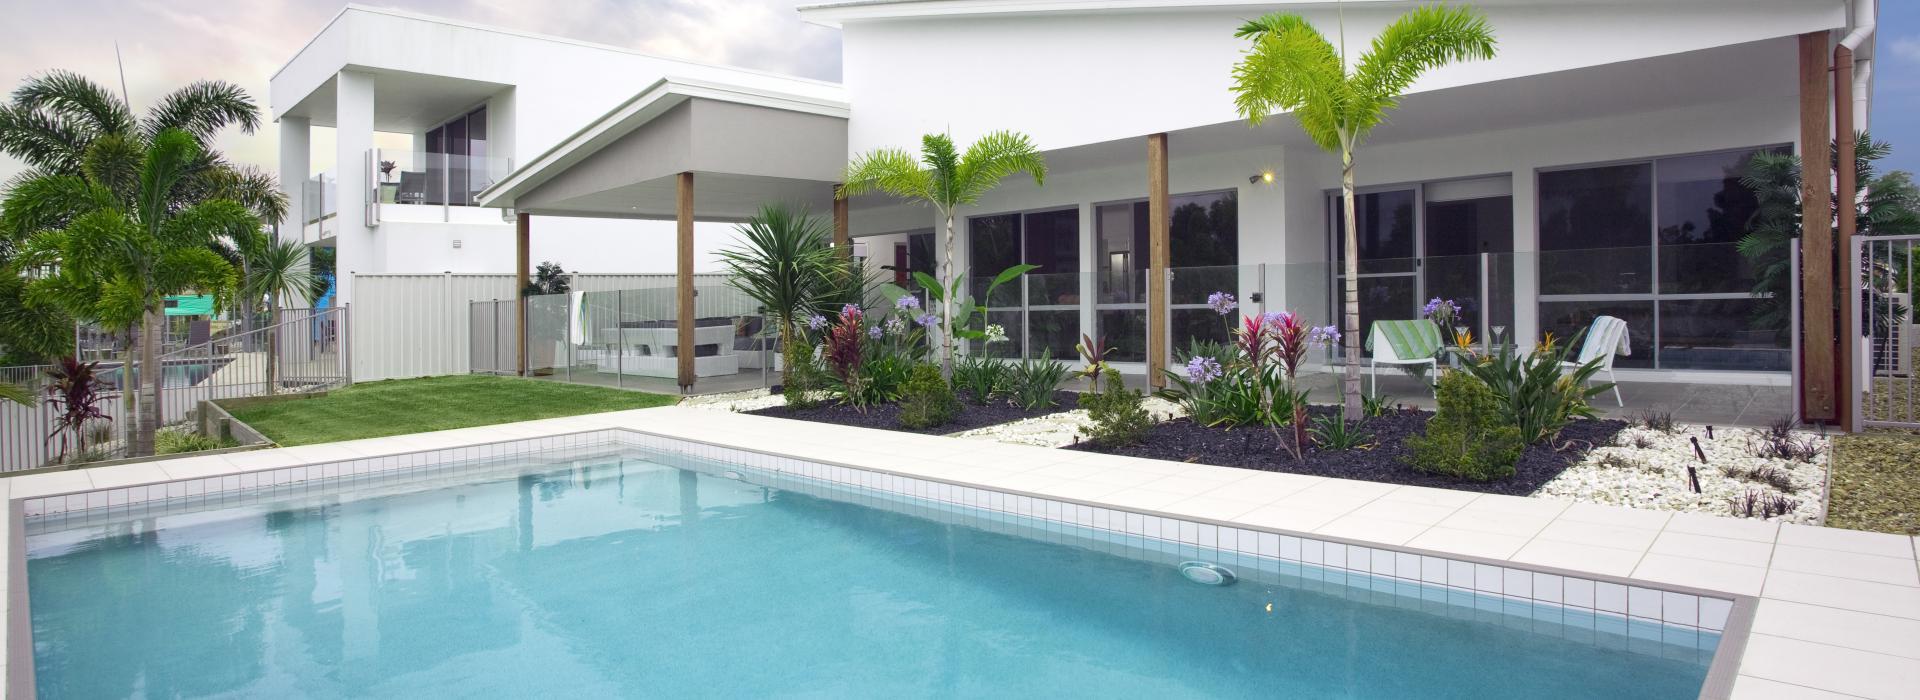 Design Real Estate Home